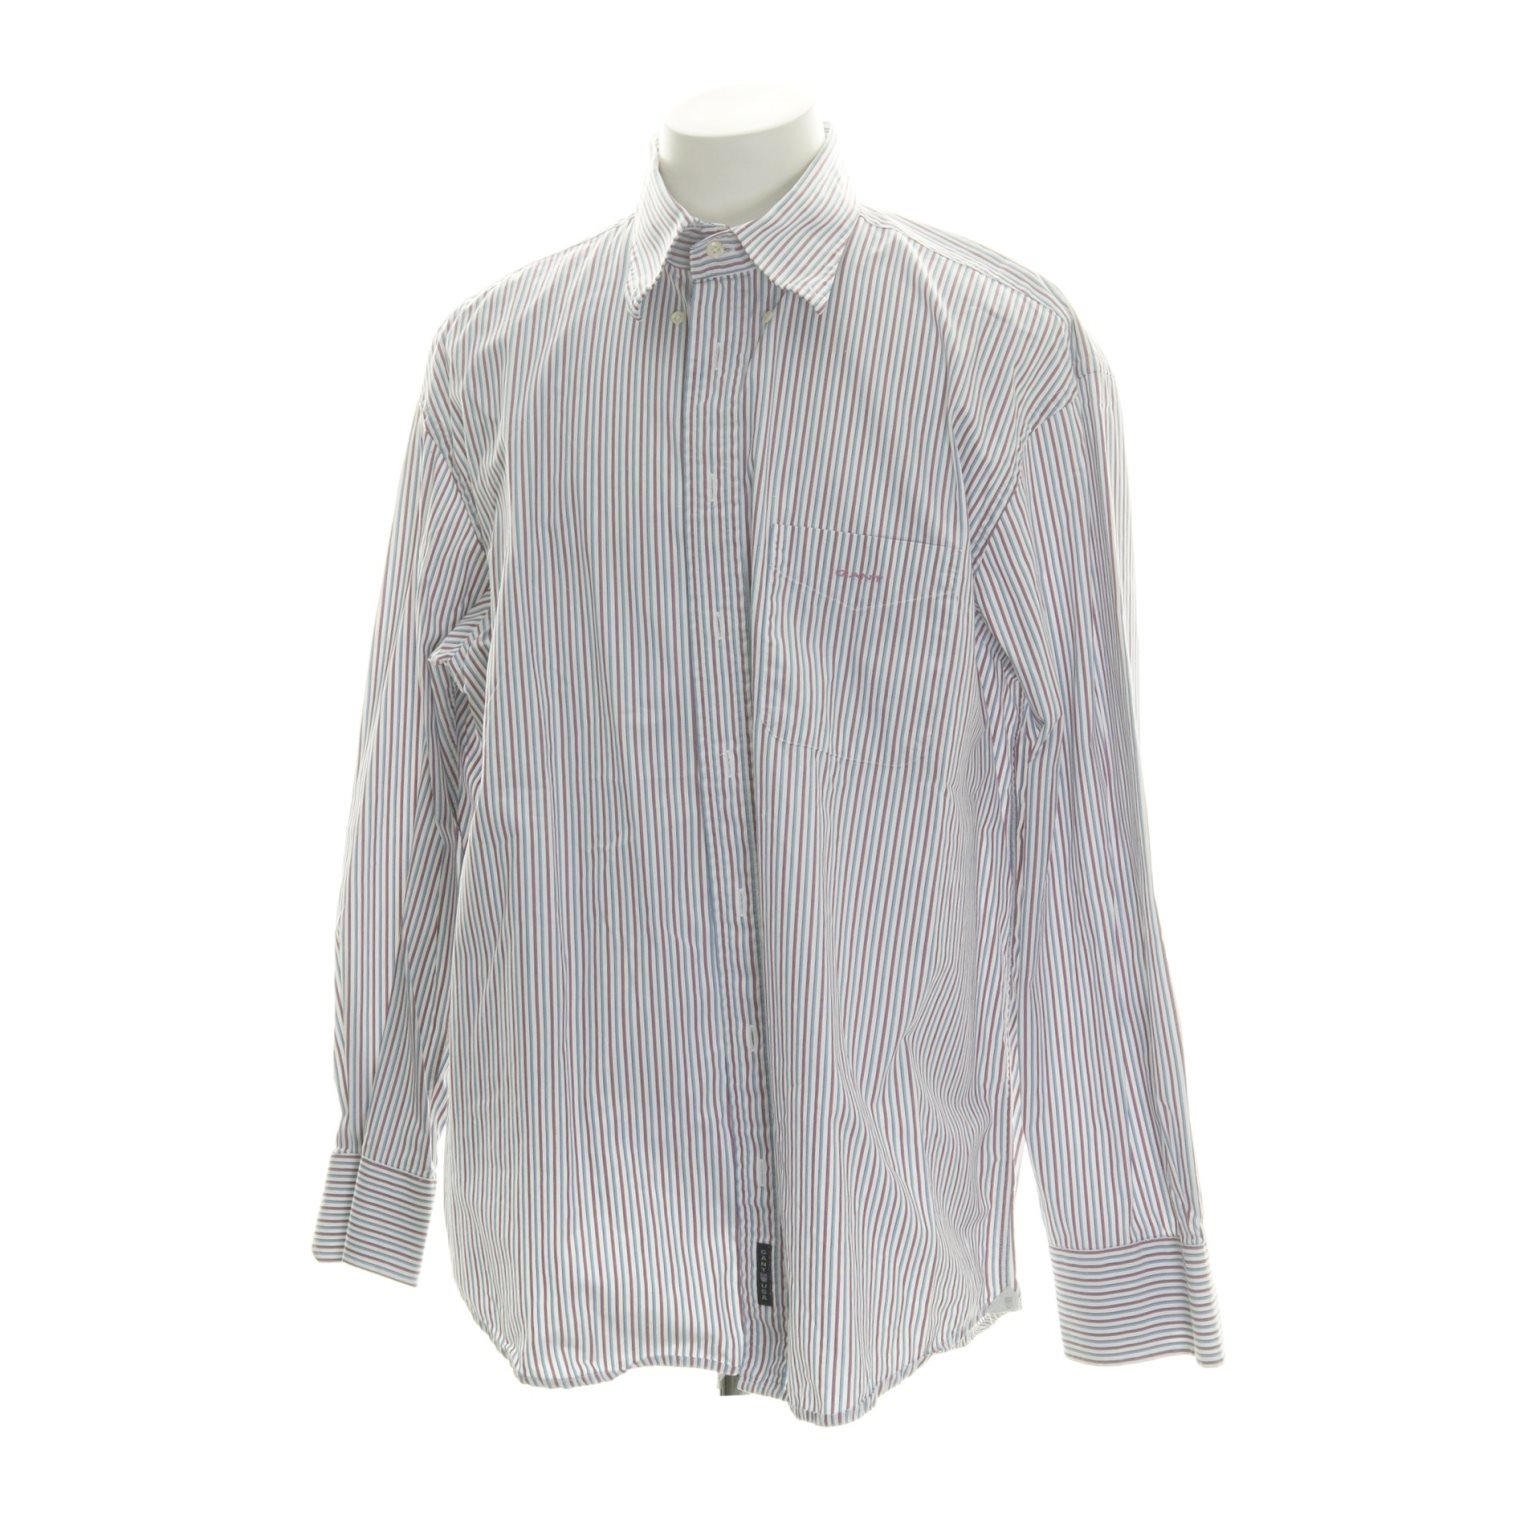 GANT, Buttondown-skjorta, Strl: XXL, Vit/Blå/Rosa